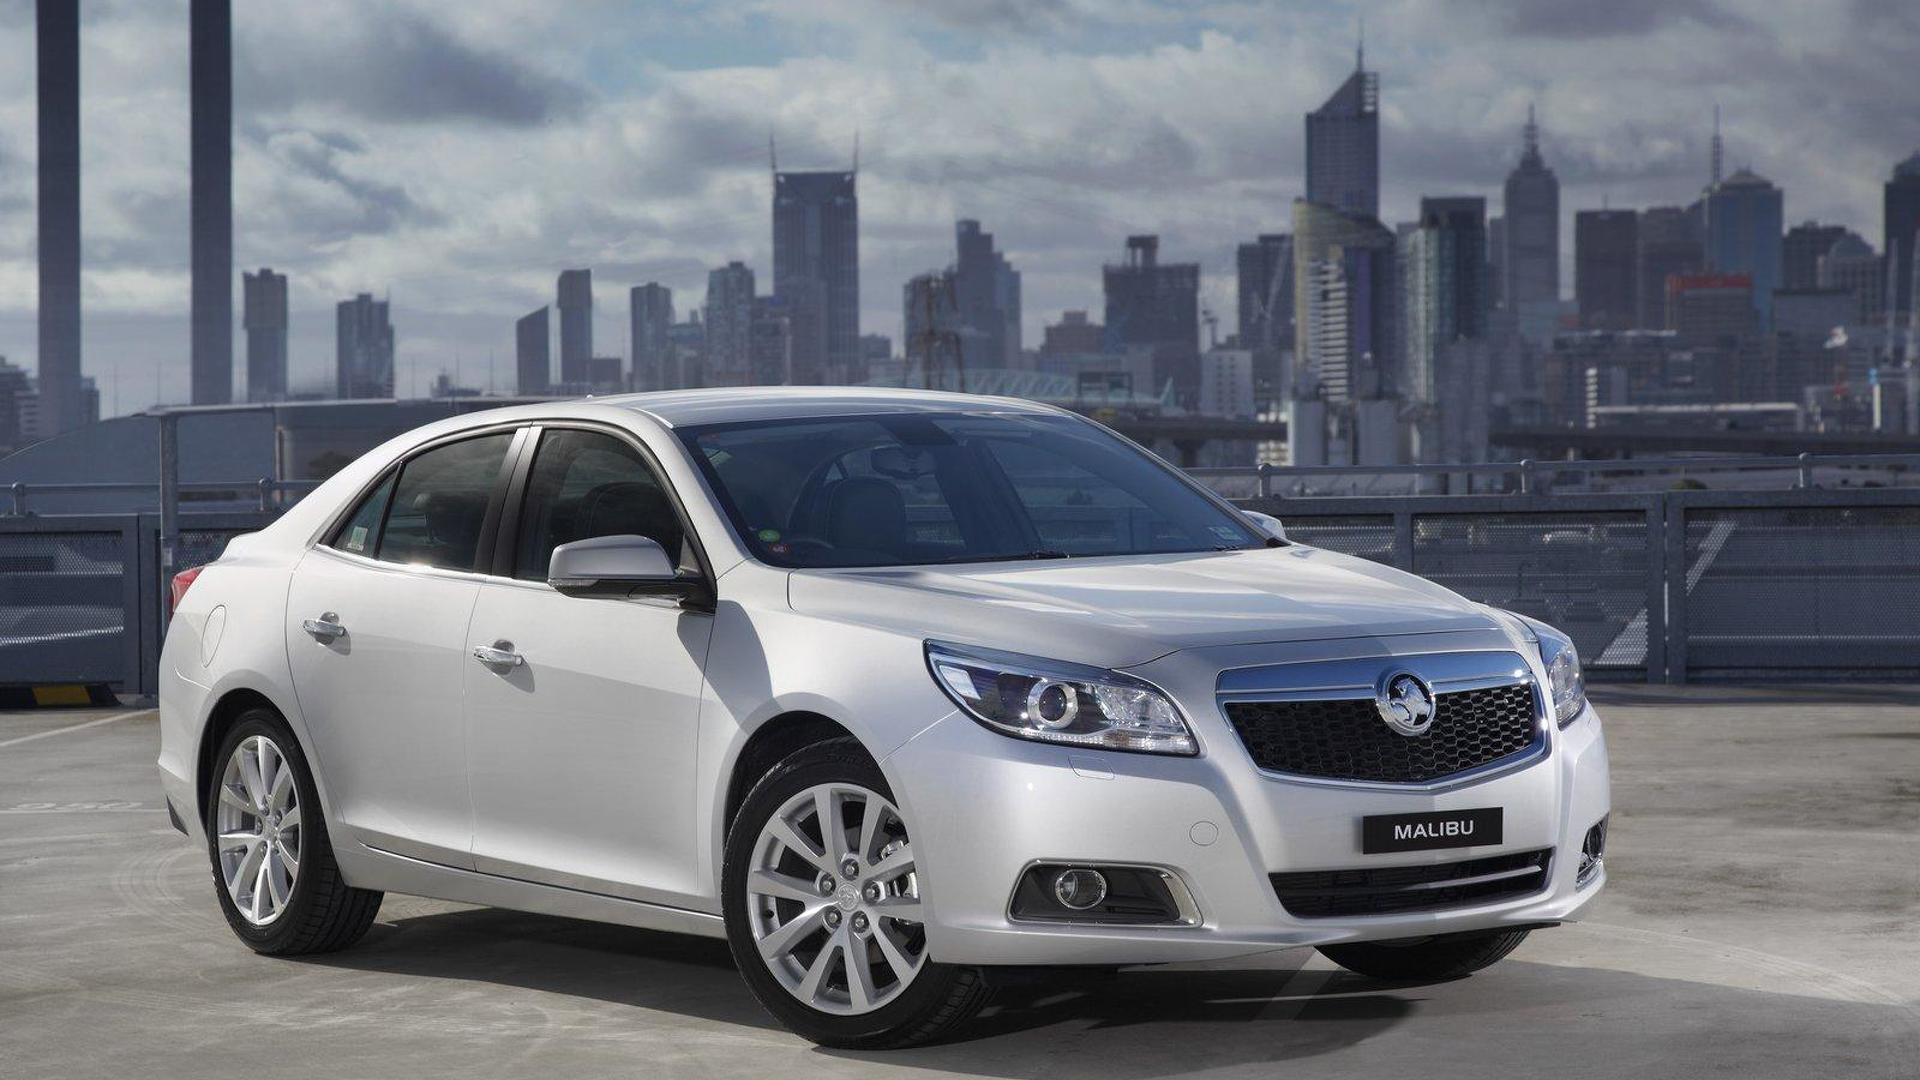 2013 Holden Malibu engine lineup announced